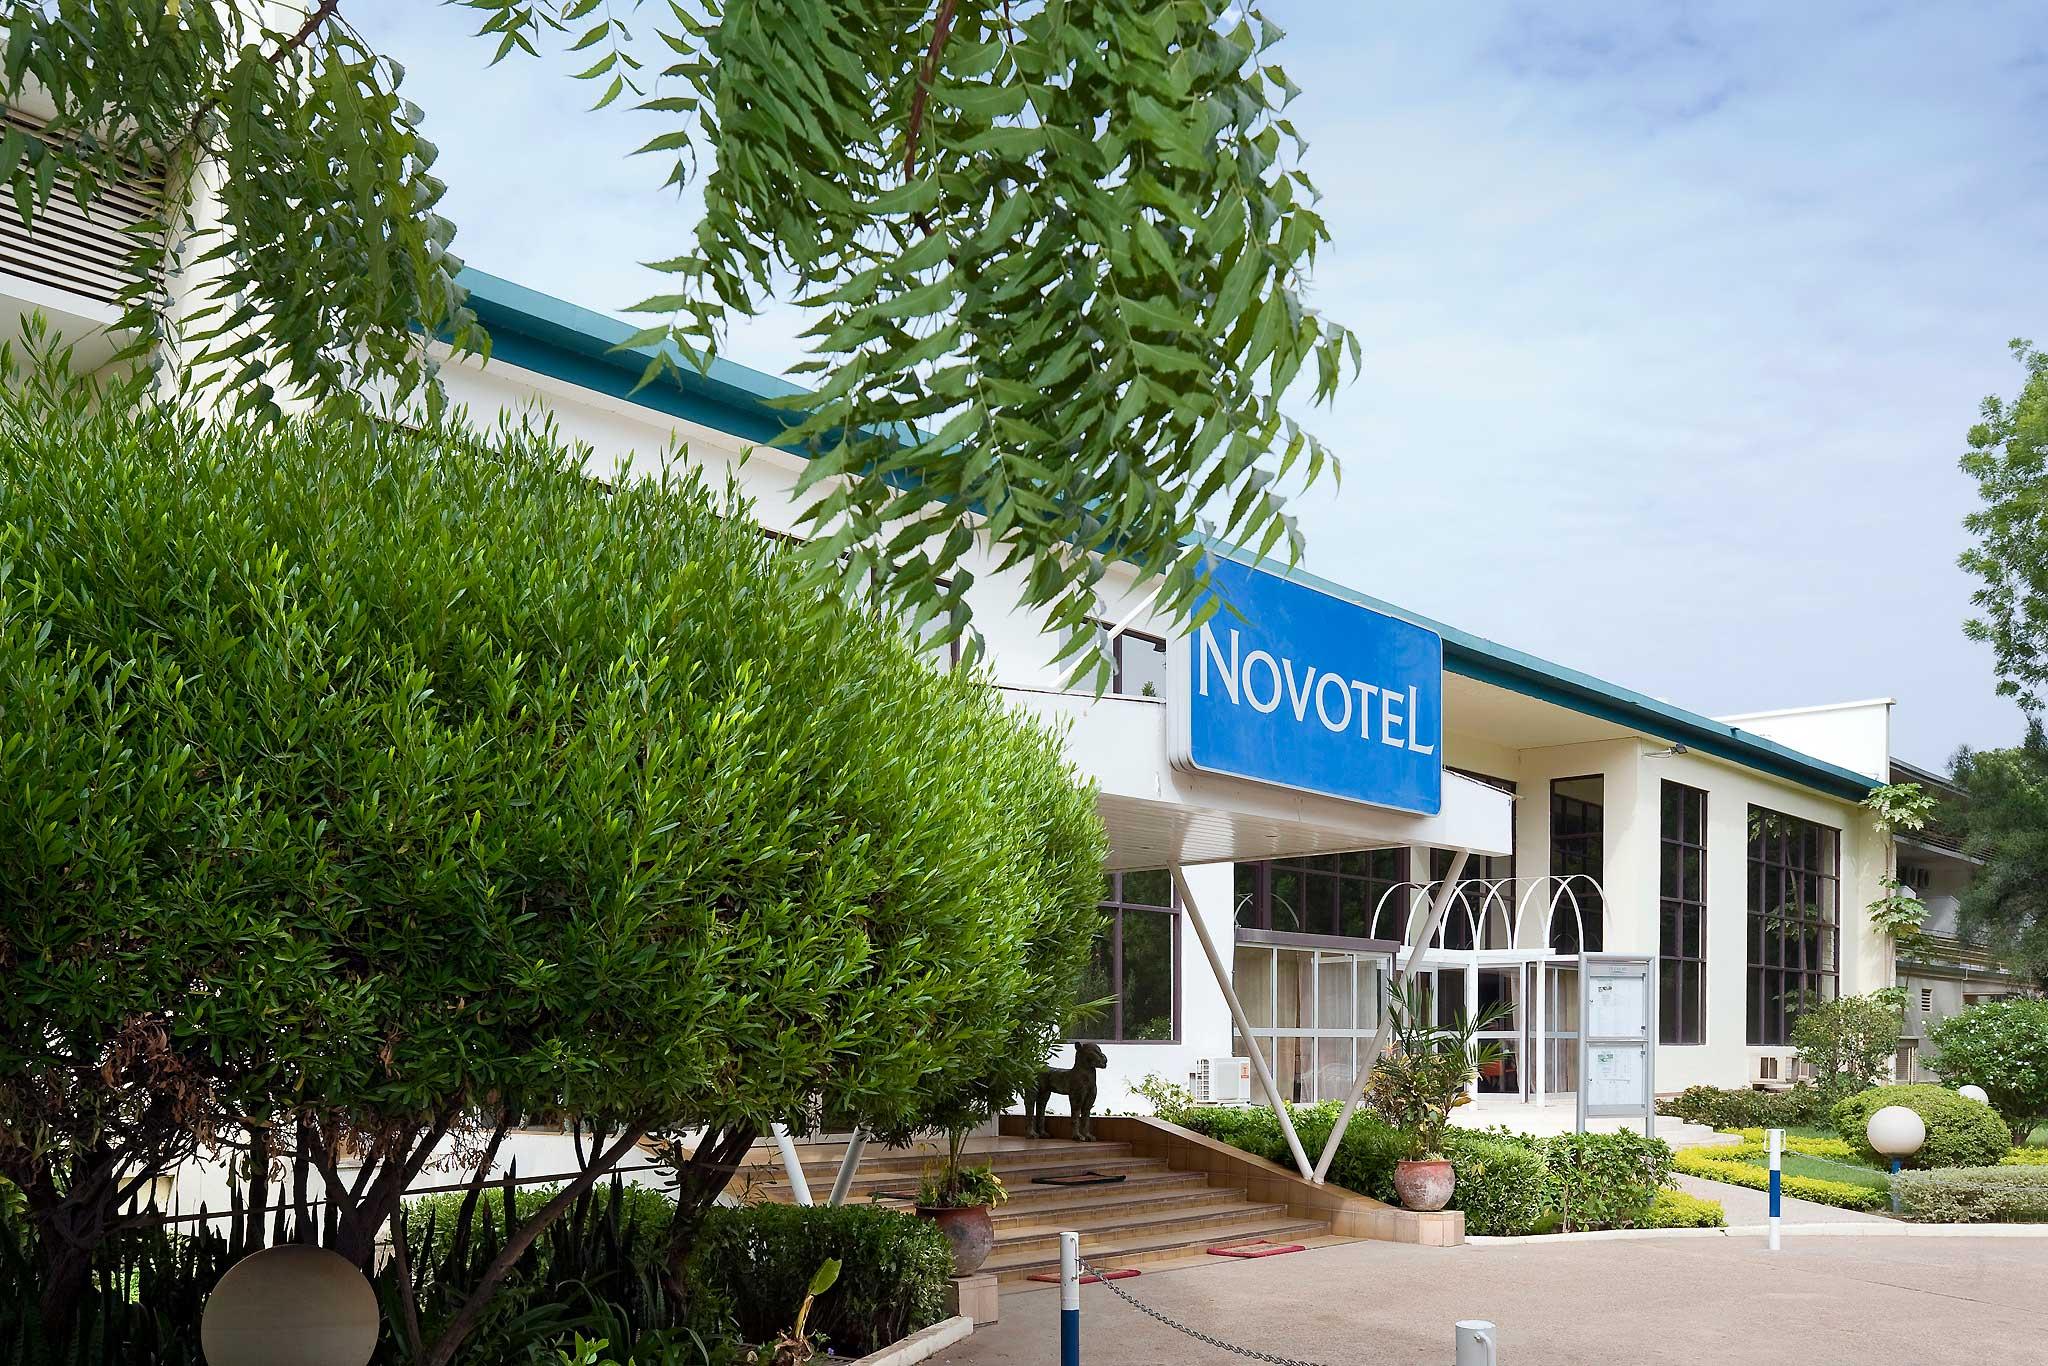 Hotel – Novotel n'Djamena La Tchadienne